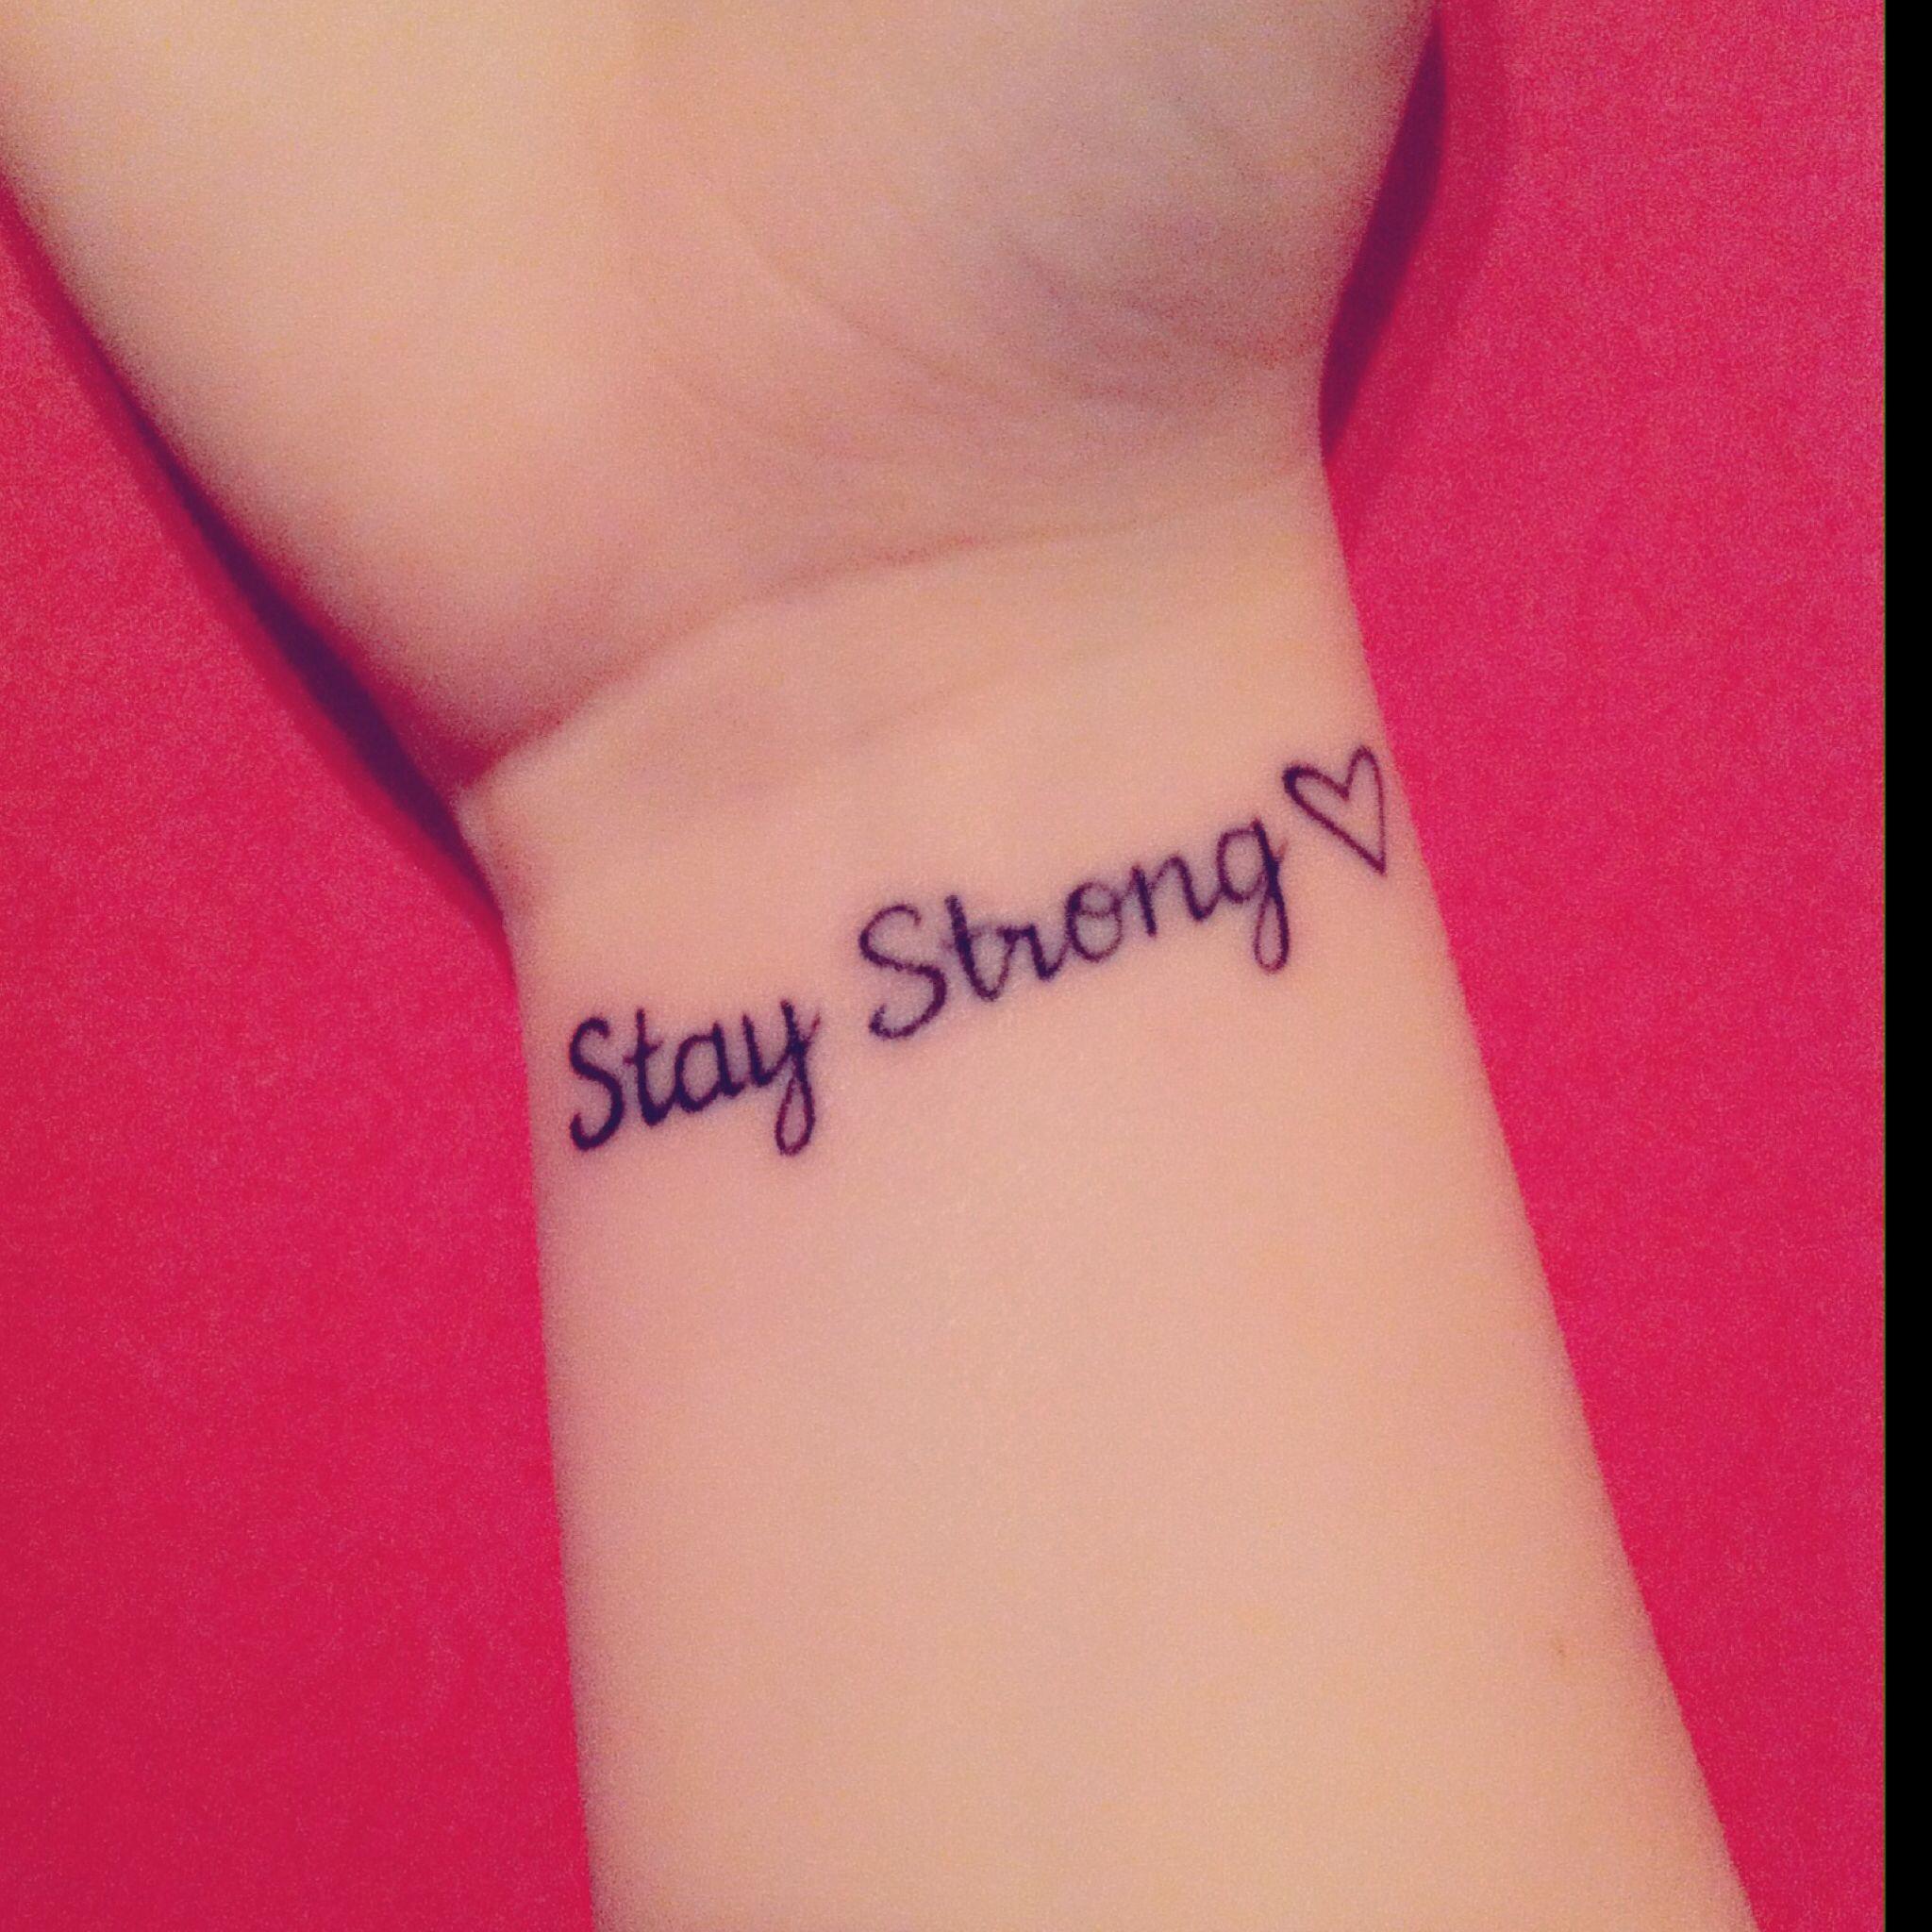 My First Tattoo Proud Of It Stay Strong Tattoo Small Tattoo